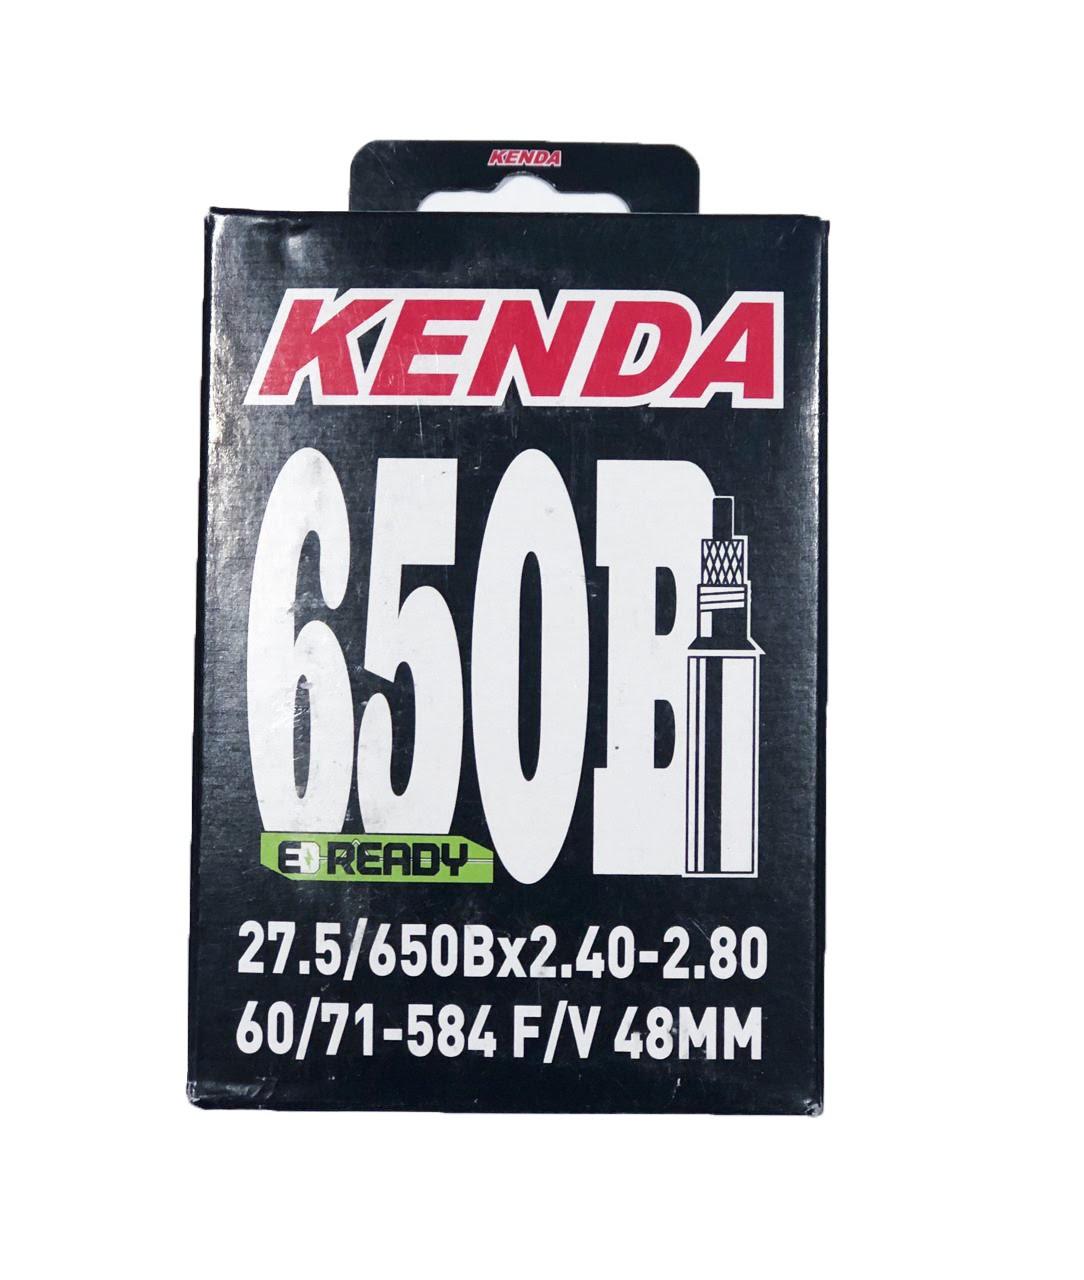 Камера KENDA 27.5/650Bx2.40-2.80, 60/71-584, F/V-48 mm